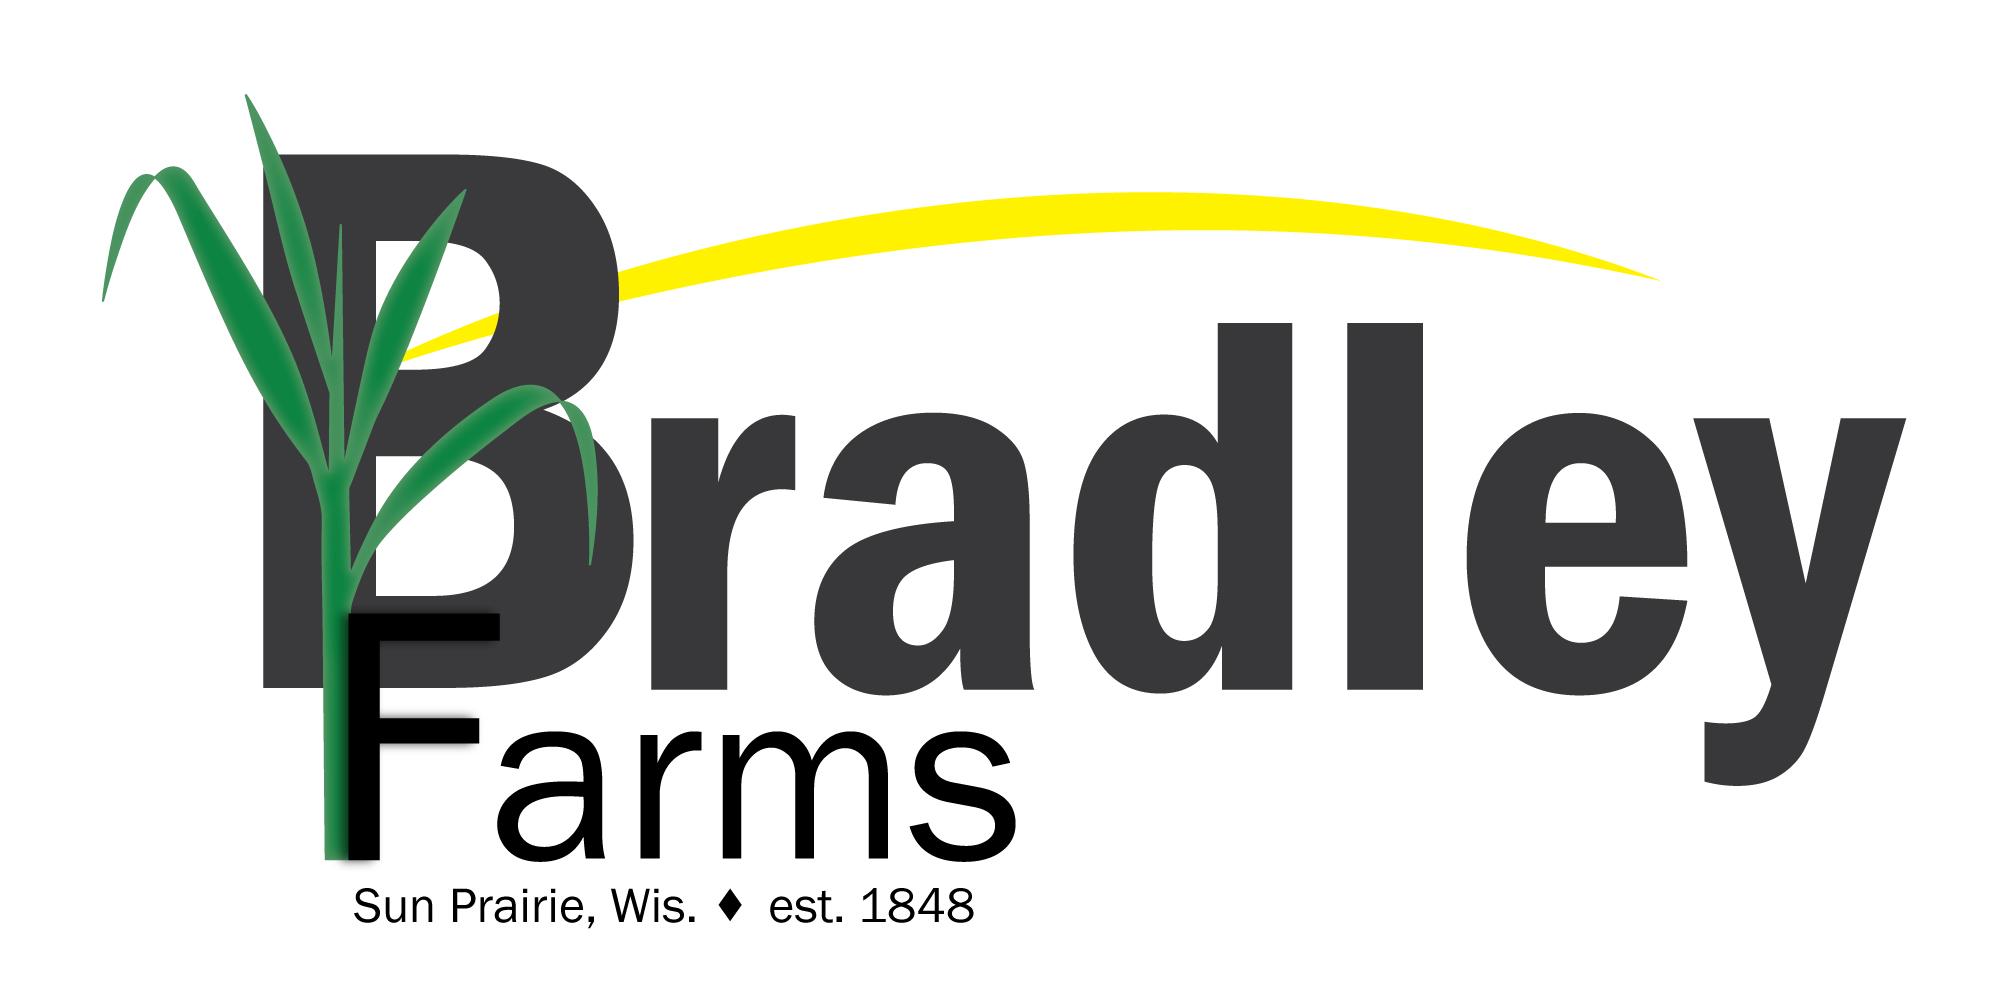 BradleyFarms Corp